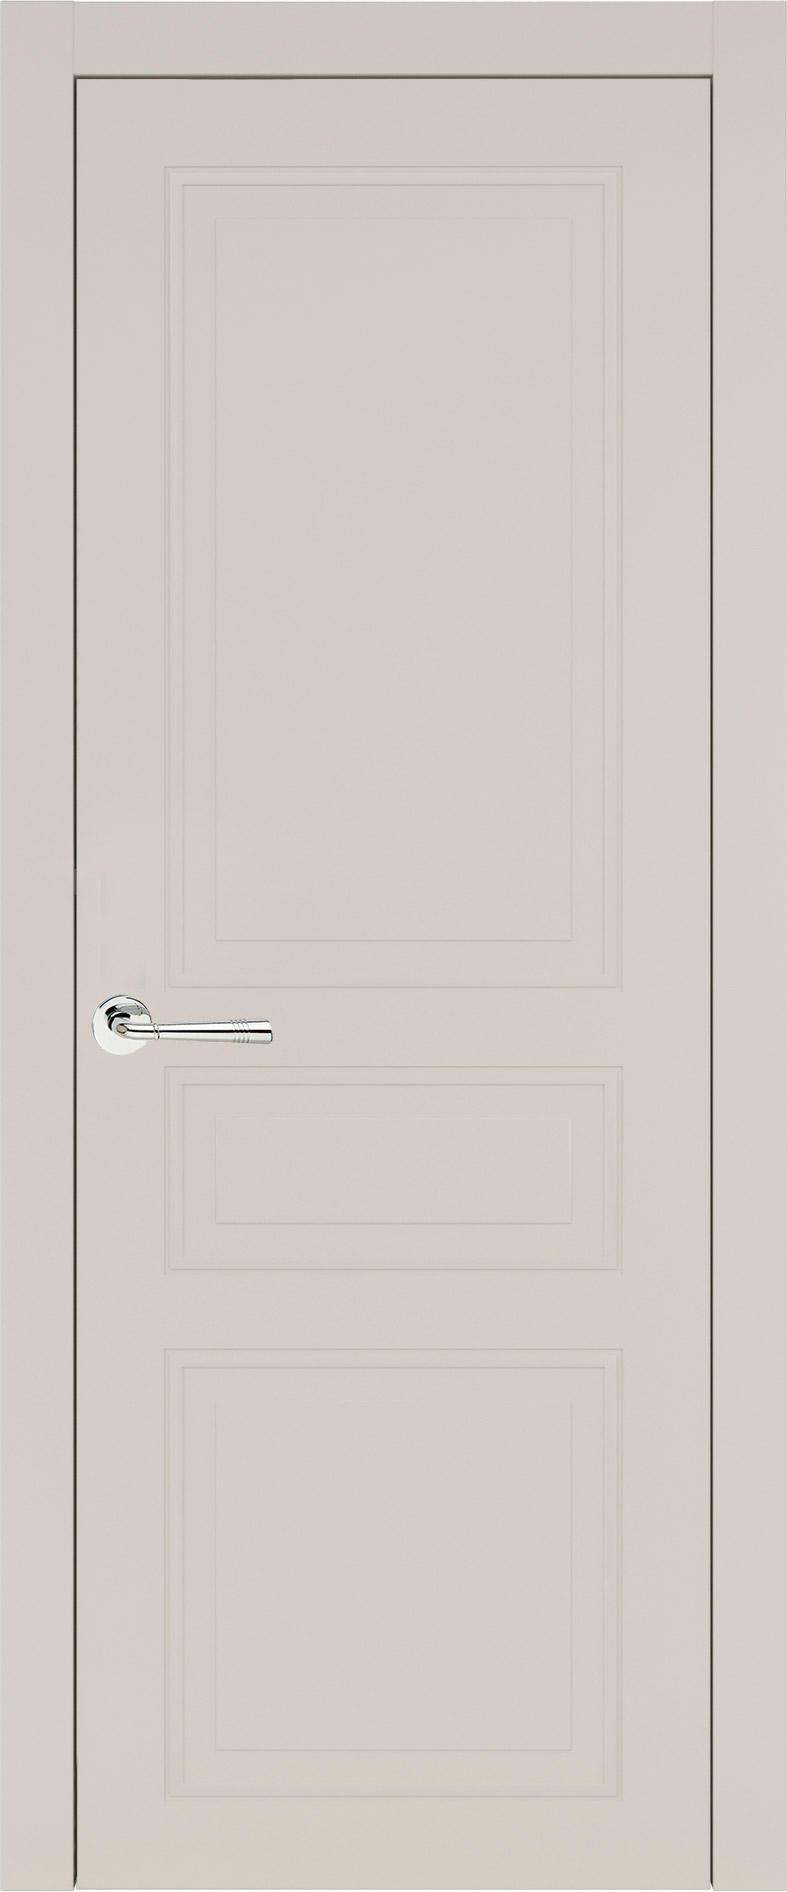 Imperia-R Neo Classic цвет - Жемчужная эмаль (RAL 1013) Без стекла (ДГ)